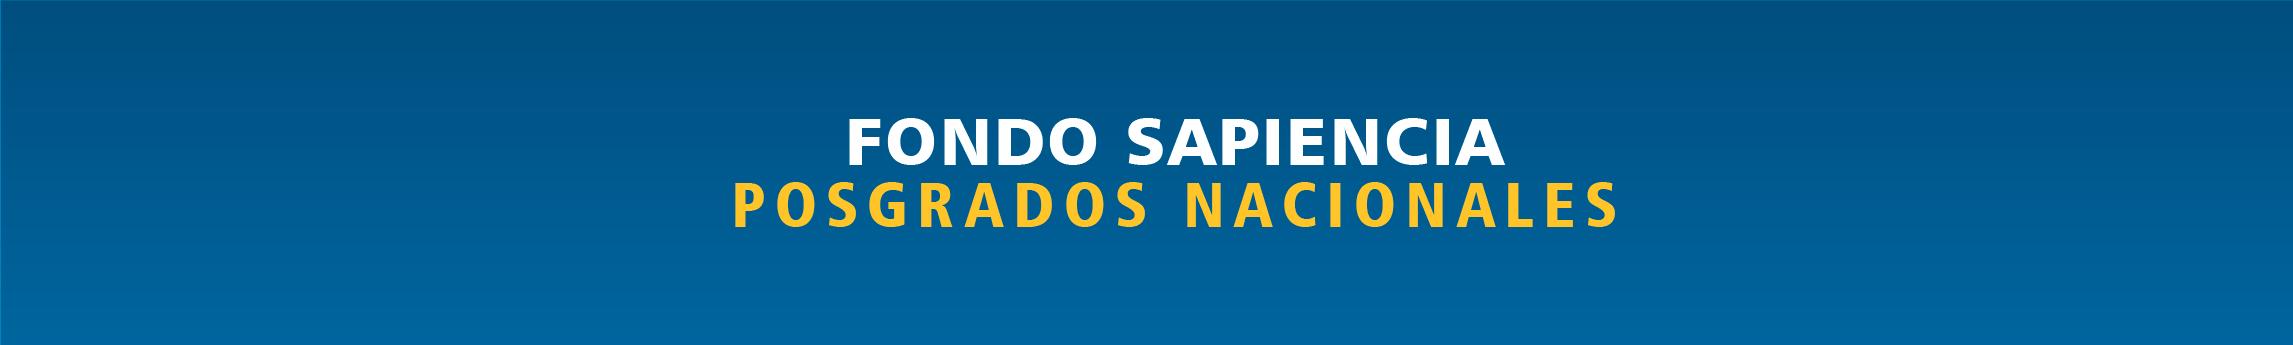 banner-fondos-sapiencia-posgrados-micrositio-nacionales